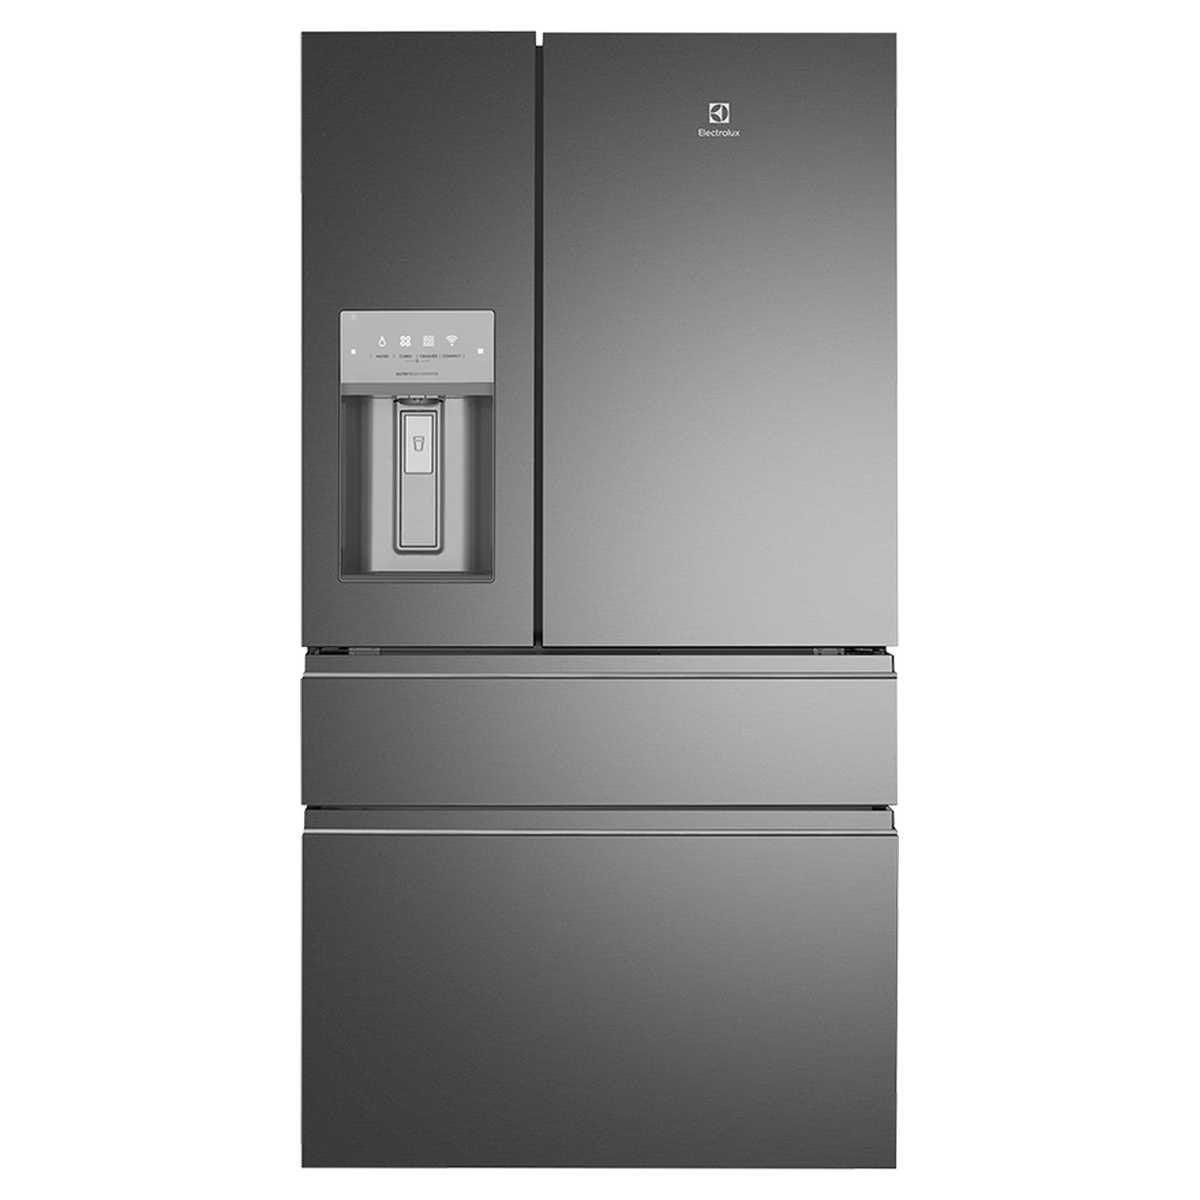 Electrolux EHE6899BA Refrigerator